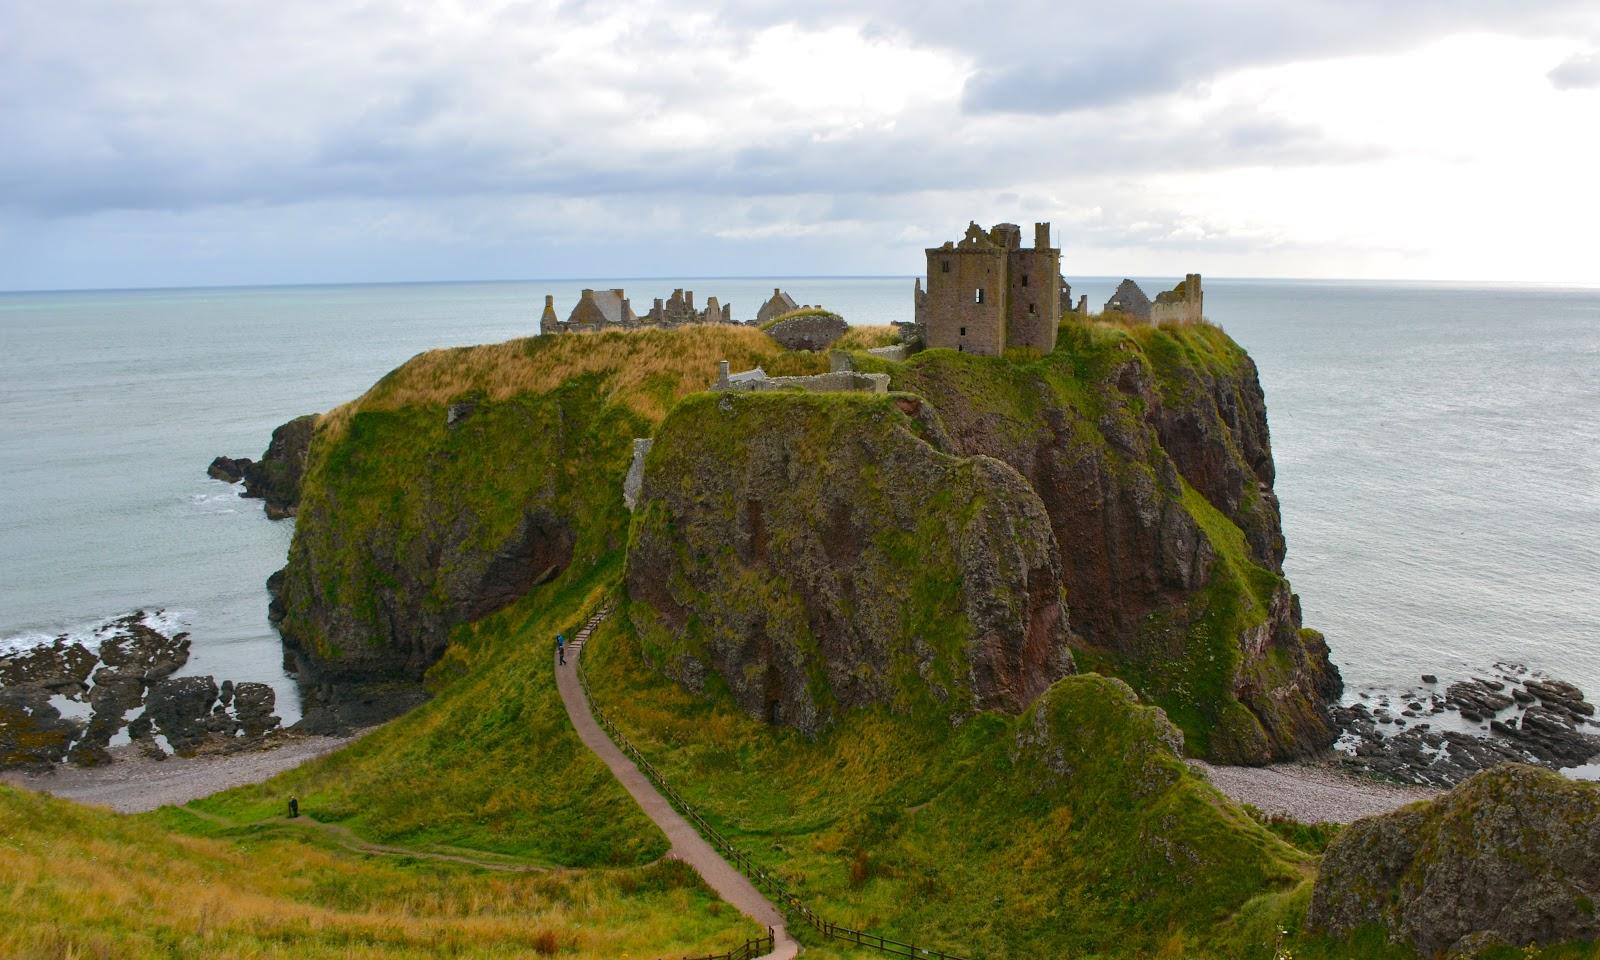 Dunnottar Castle in Scotland